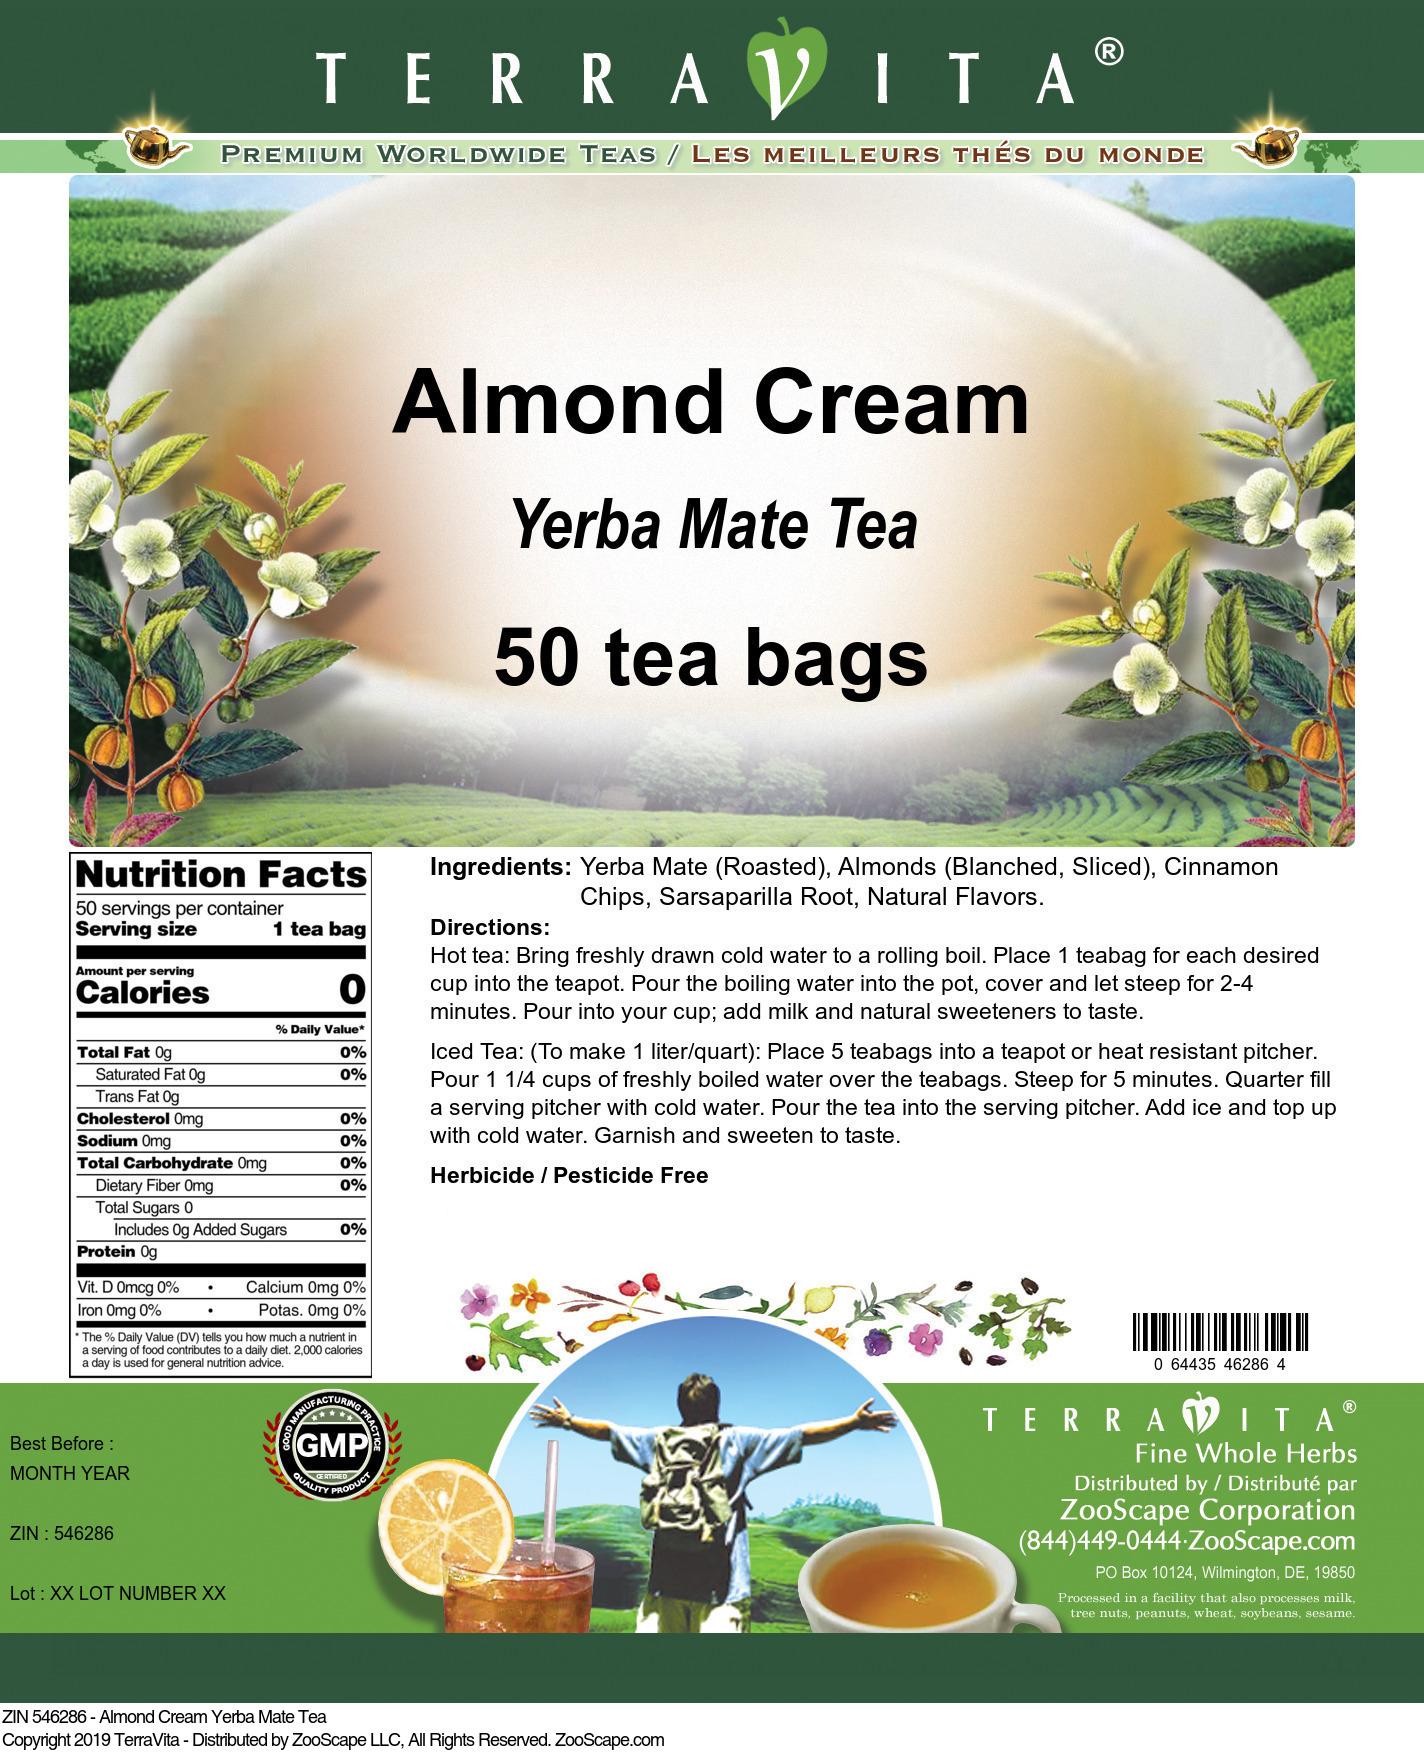 Almond Cream Yerba Mate